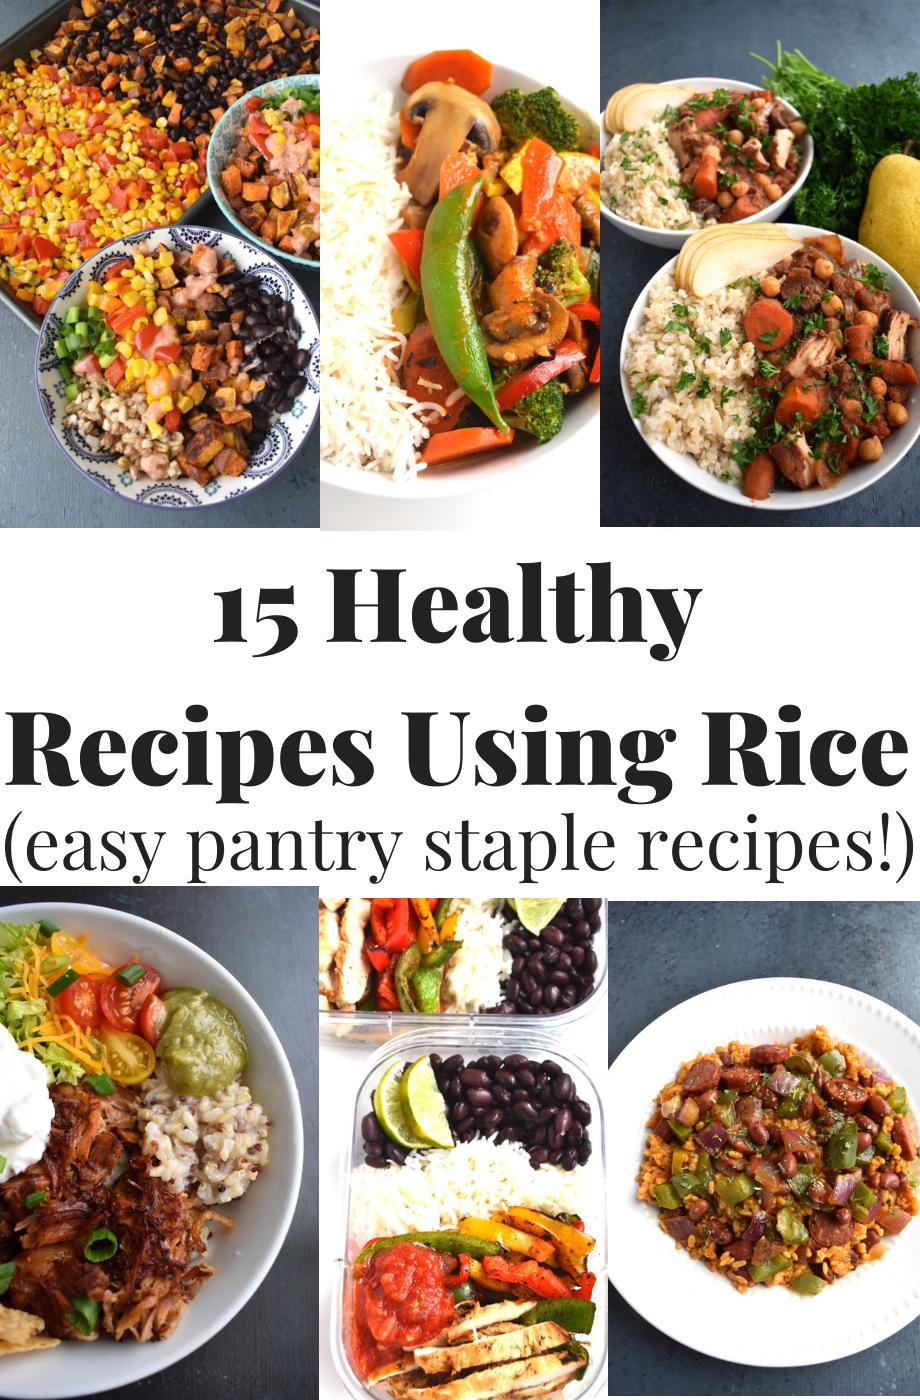 15 Healthy Recipes Using Rice